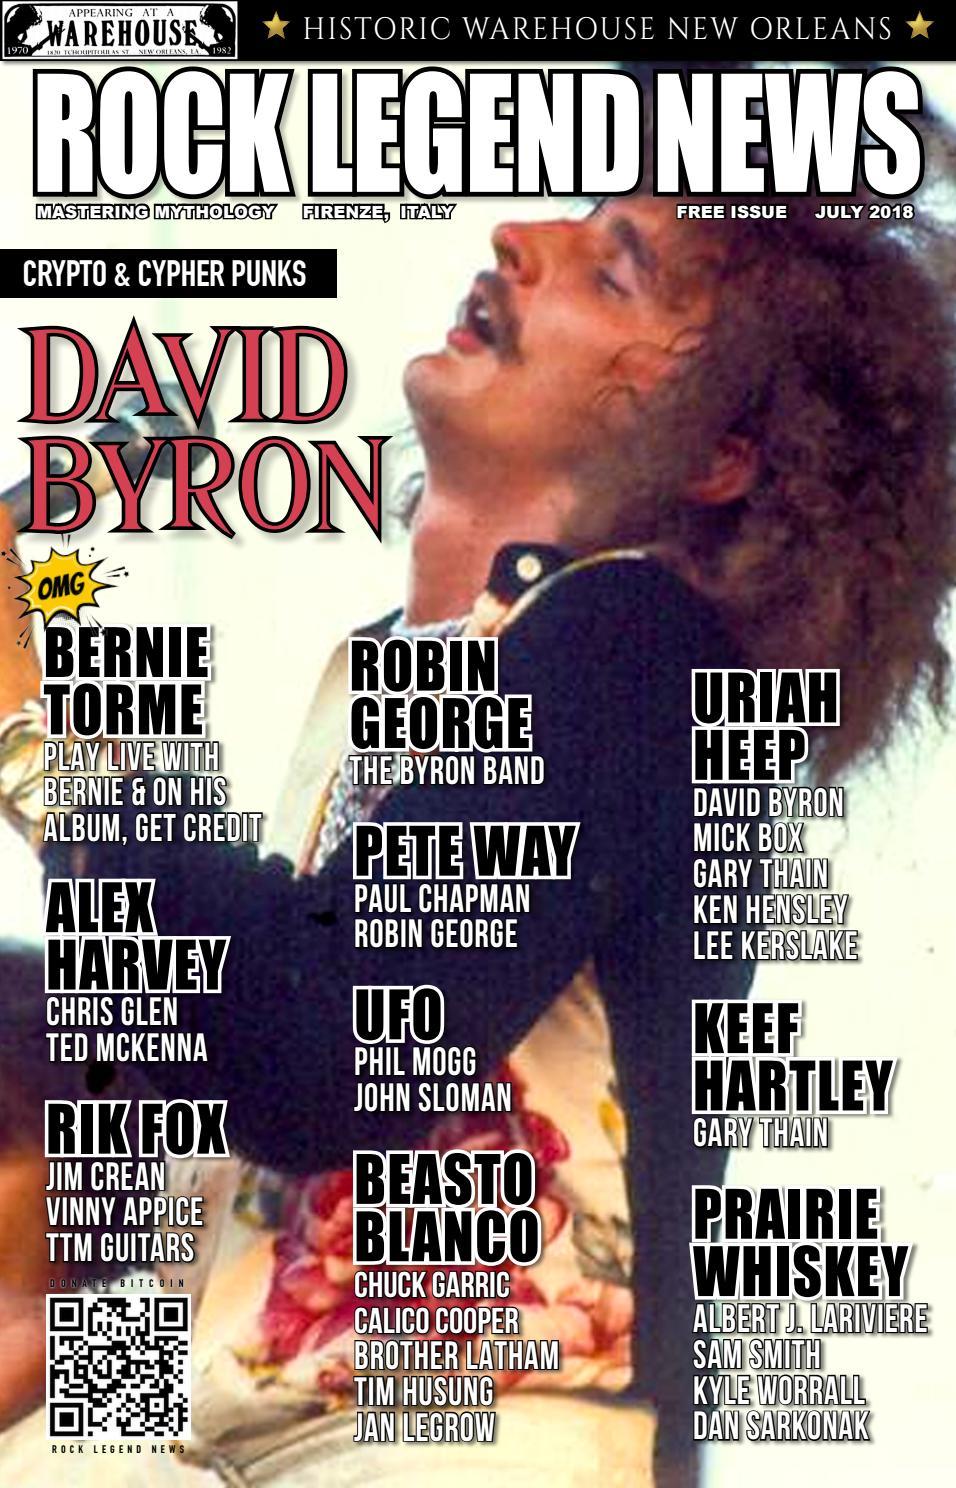 Rock Legend News July 2018 Issue Featuring David Byron Uriah Heep By Rock Legend News Issuu